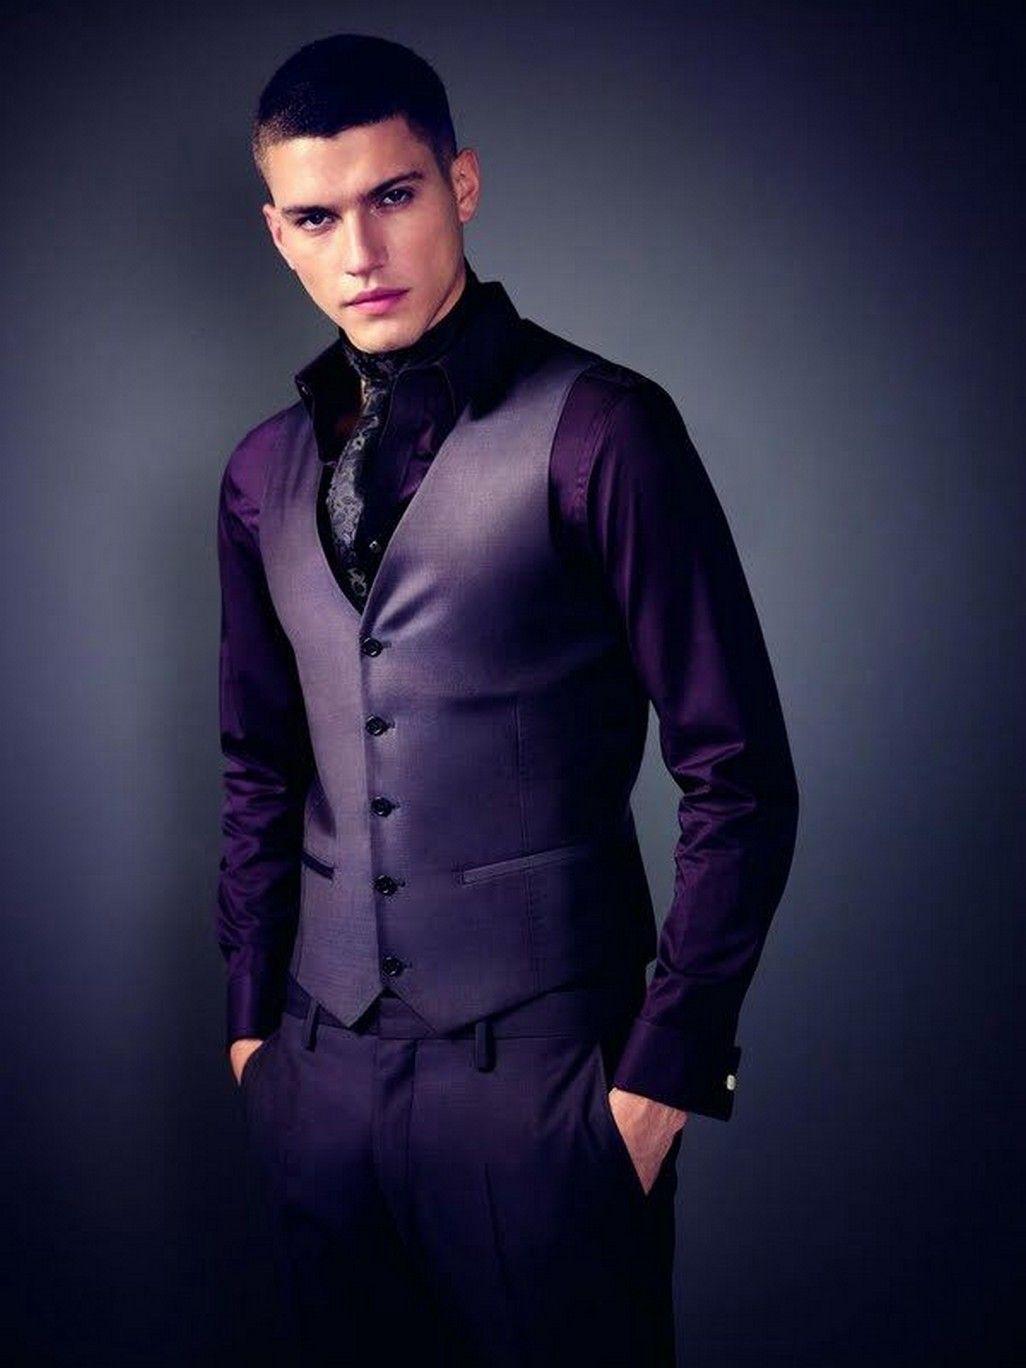 Dark Purple Suit Men Ideas You Ll Look Amazing In